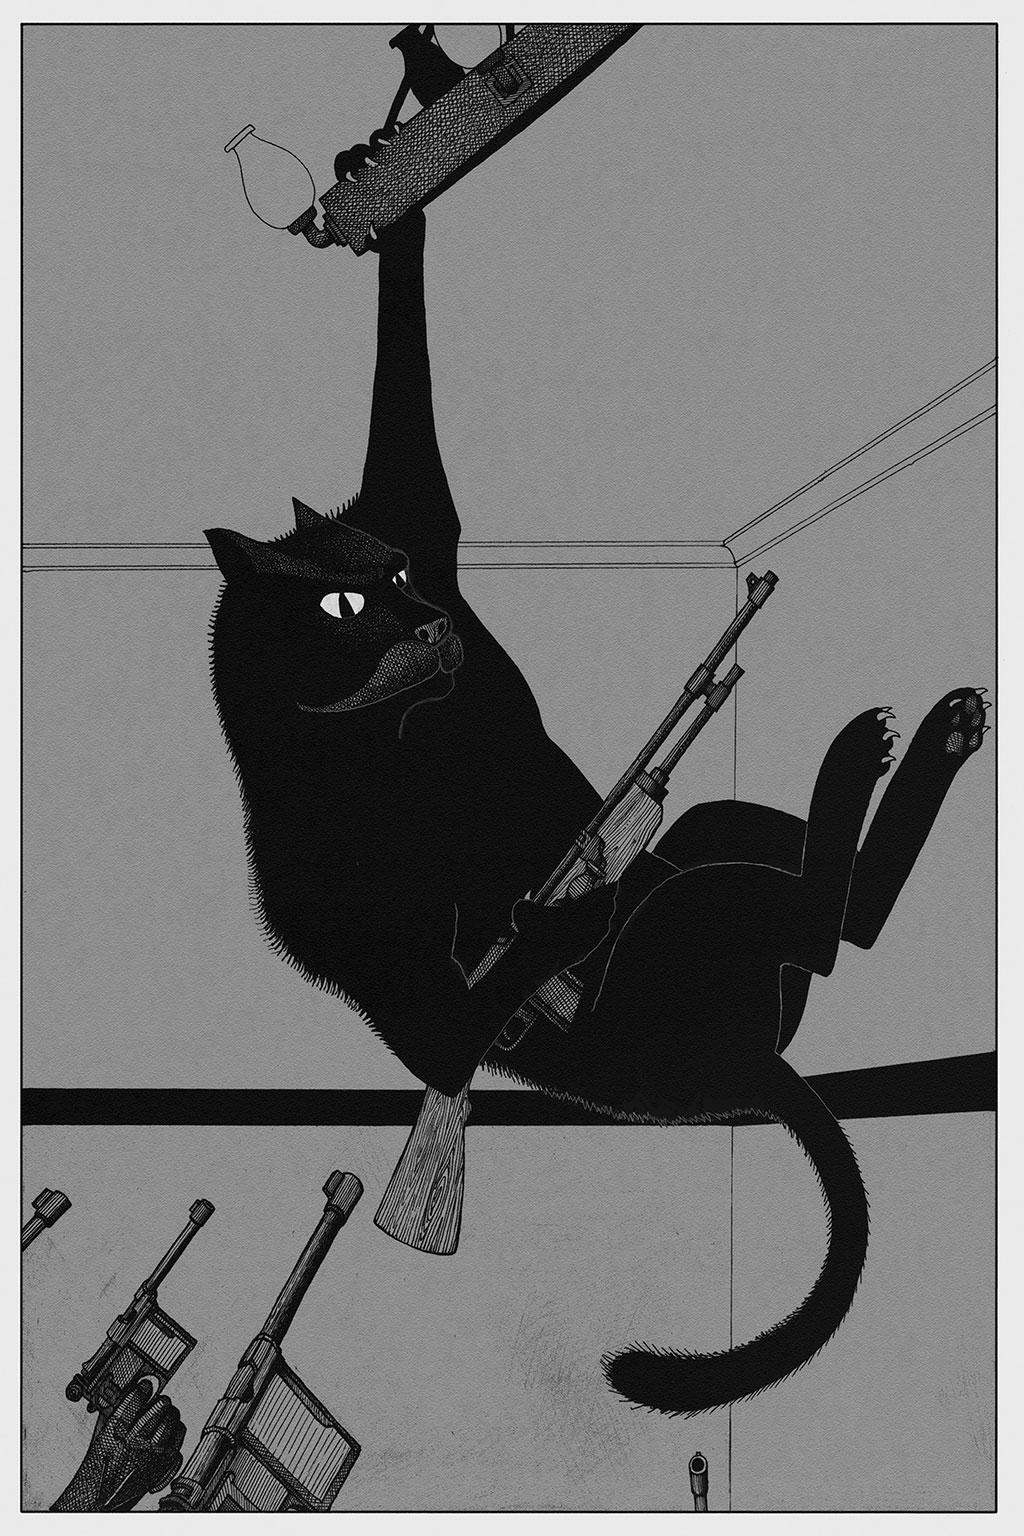 Иллюстрация Мастер и Маргарита Чарли Стоун 14